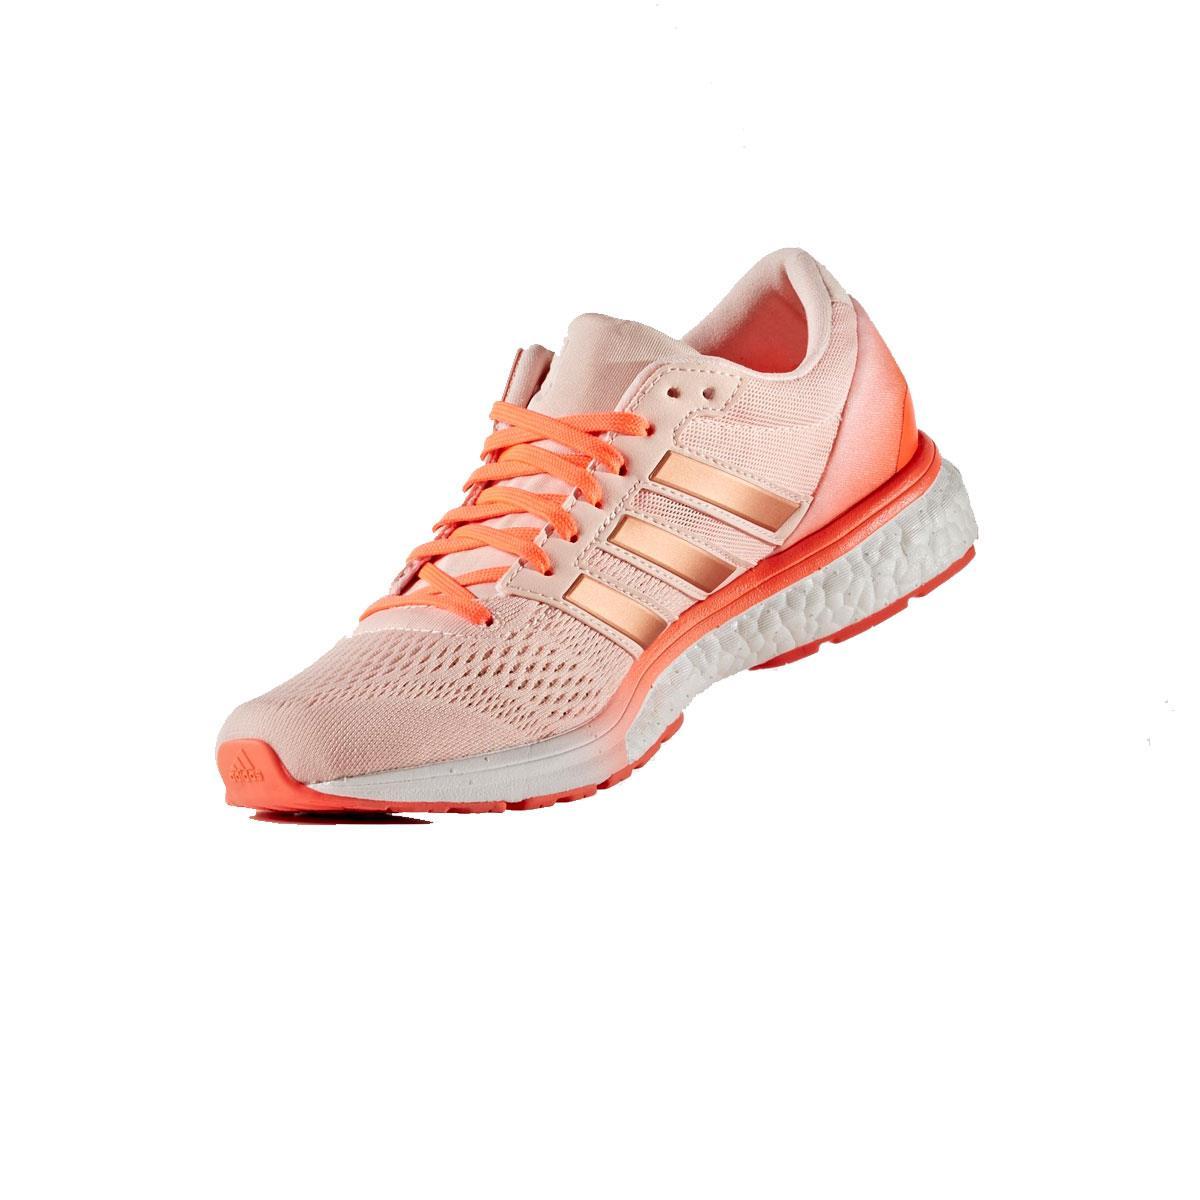 Tênis Adidas Adizero Boston 6 Feminino 8fc4326d883c5